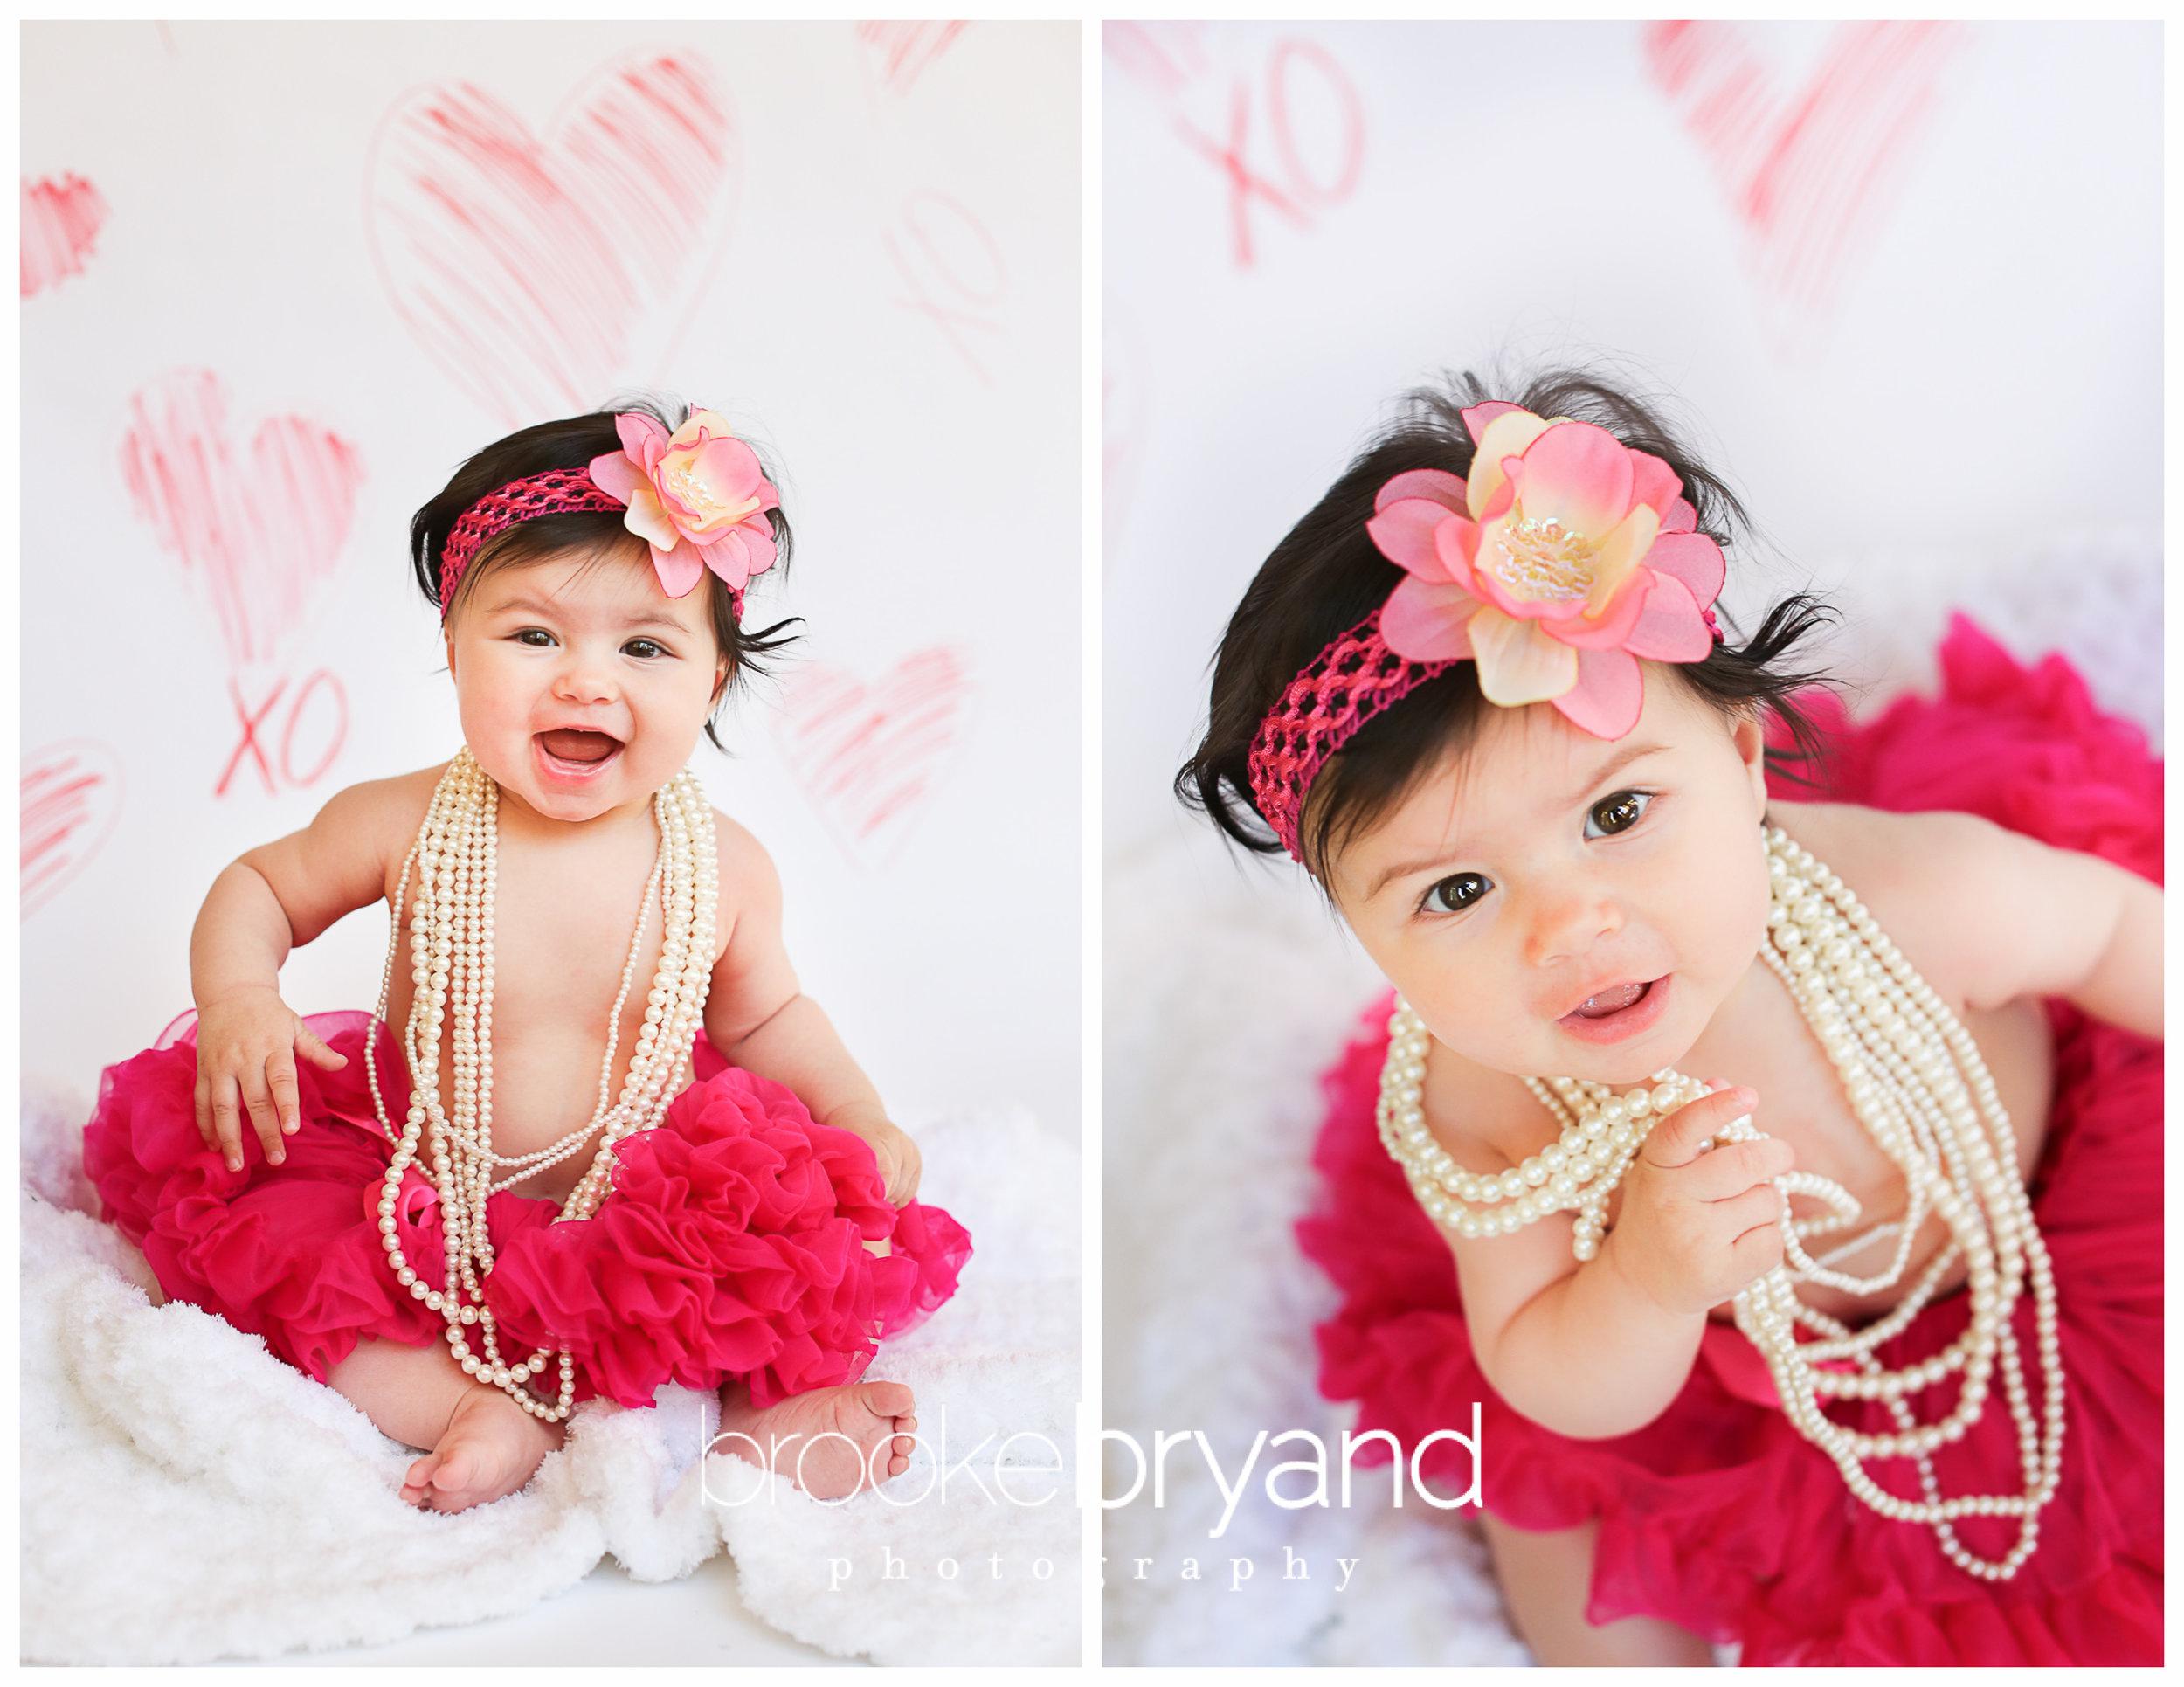 Brooke-Bryand-Photography-Valentines-Day-Child-Photo-2-up-lily-vday.jpg